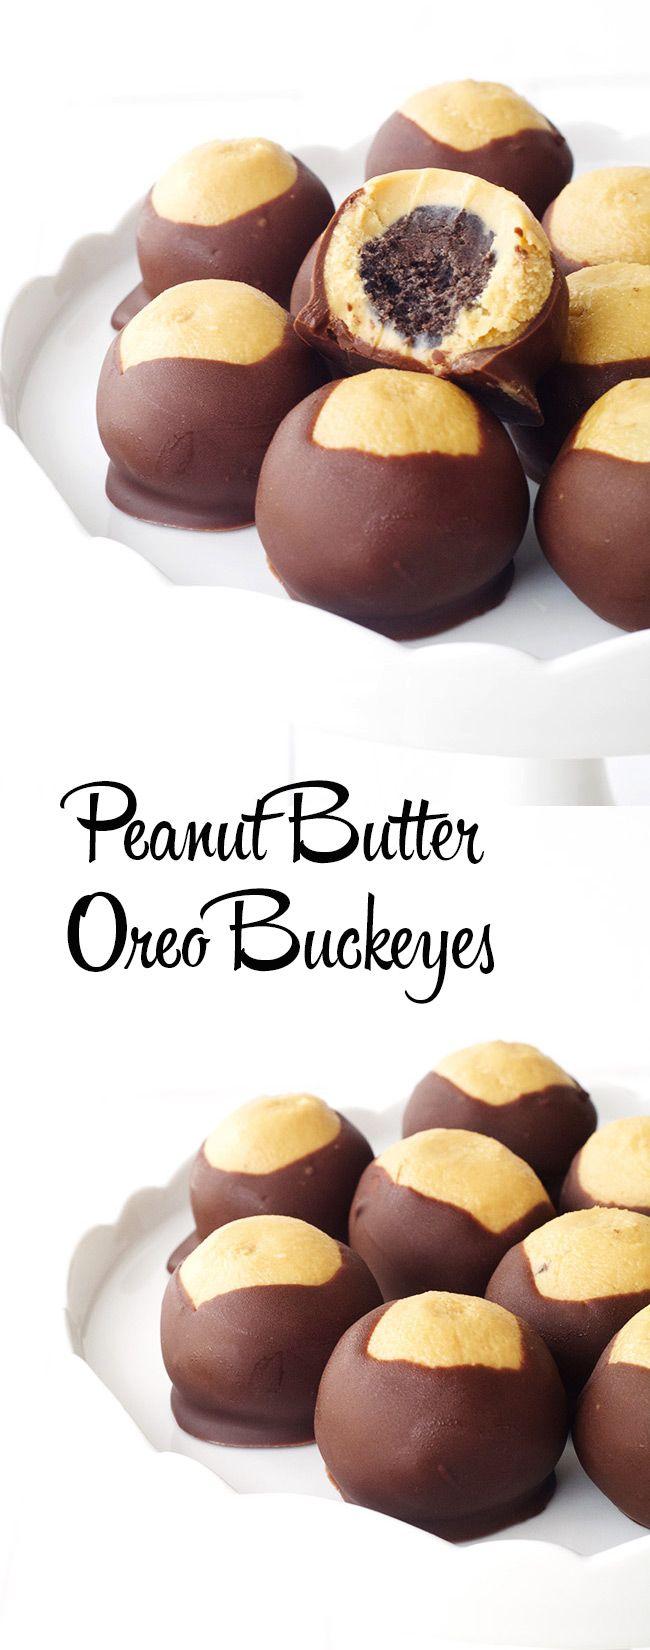 Peanut Butter Buckeyes with an Oreo twist! The best buckeyes ever - Sweetest Menu